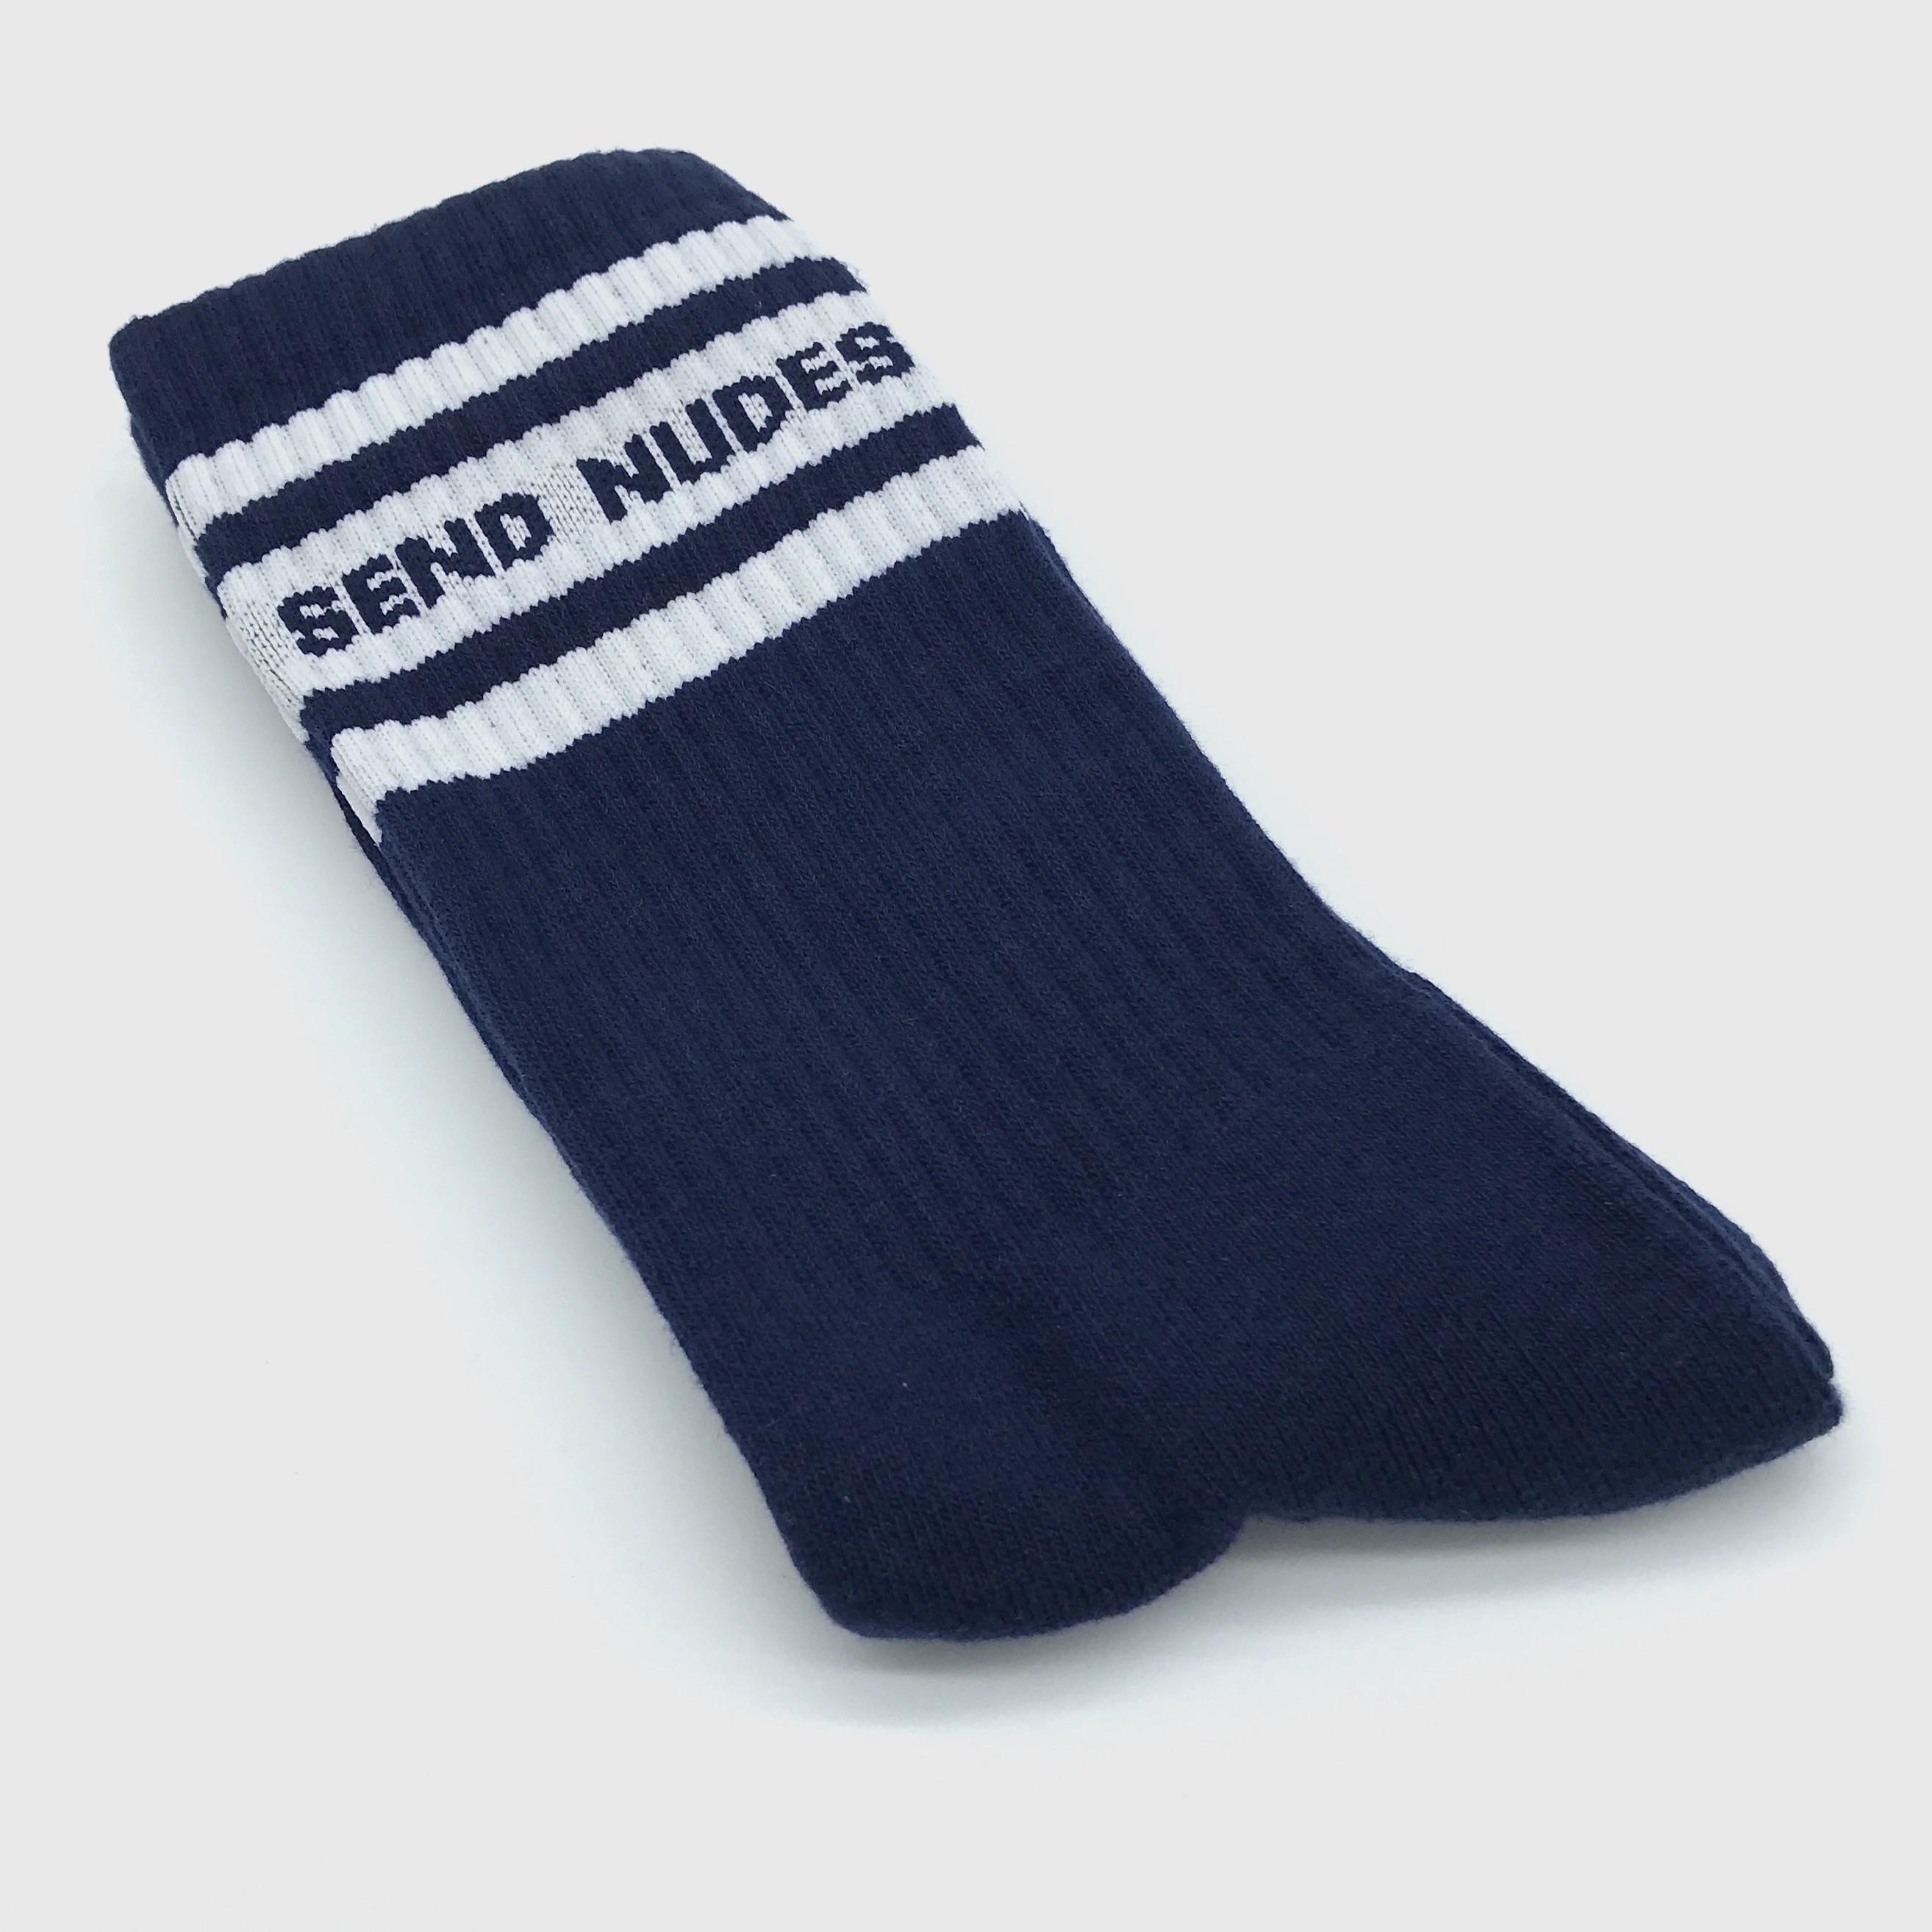 SEND NUDES NAVY/WHITE SOCKS